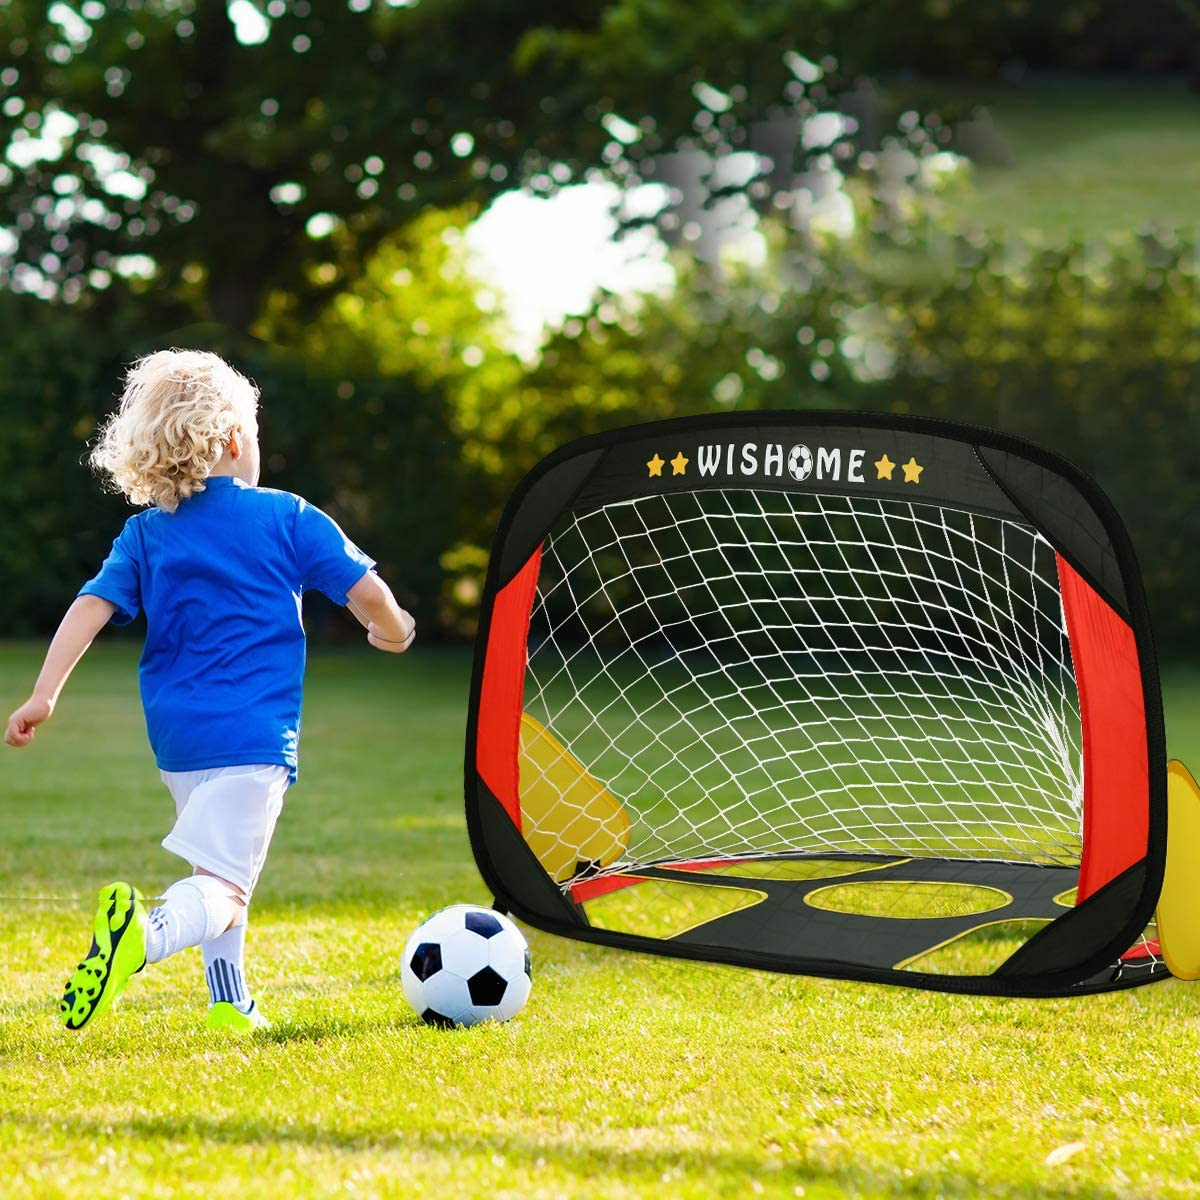 Kids Football Practice Goal for Indoor Outdoor Backyard Park Play Elikliv 2 in 1 Quick Pop Up Soccer Goal Portable Kids Soccer Net